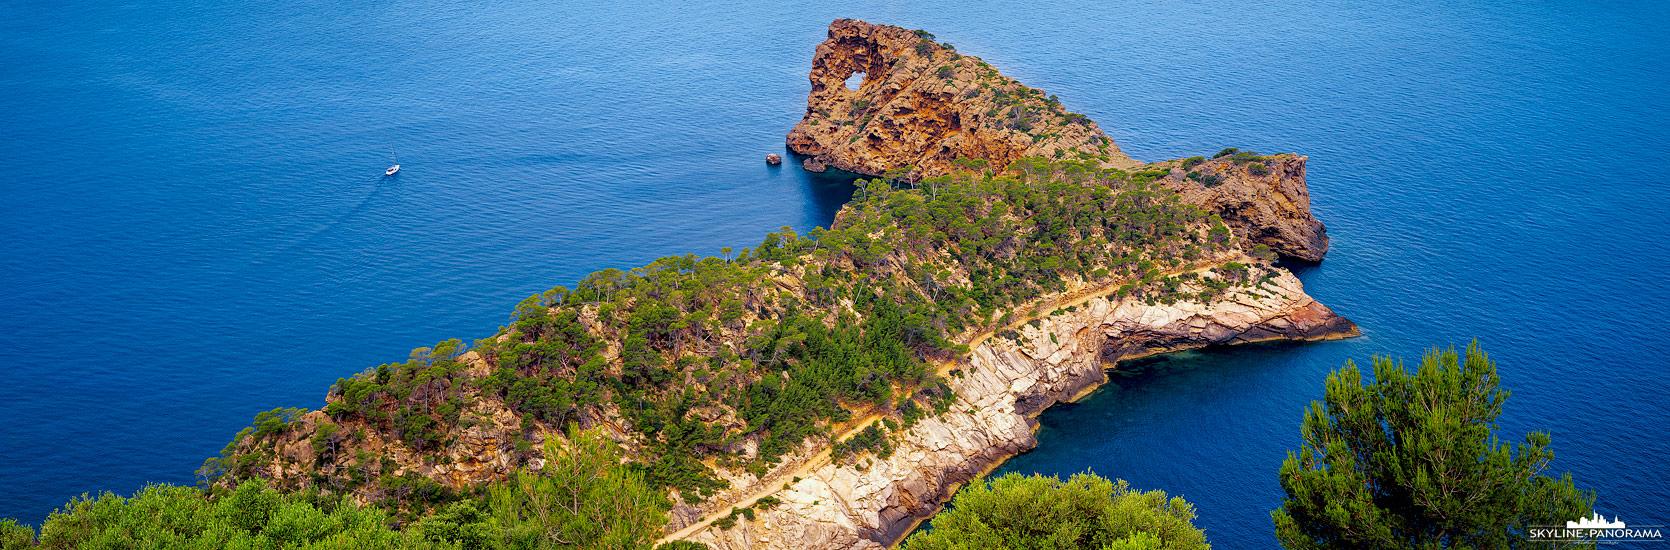 Panorama Mallorca - Sa Foradada (p_01184)